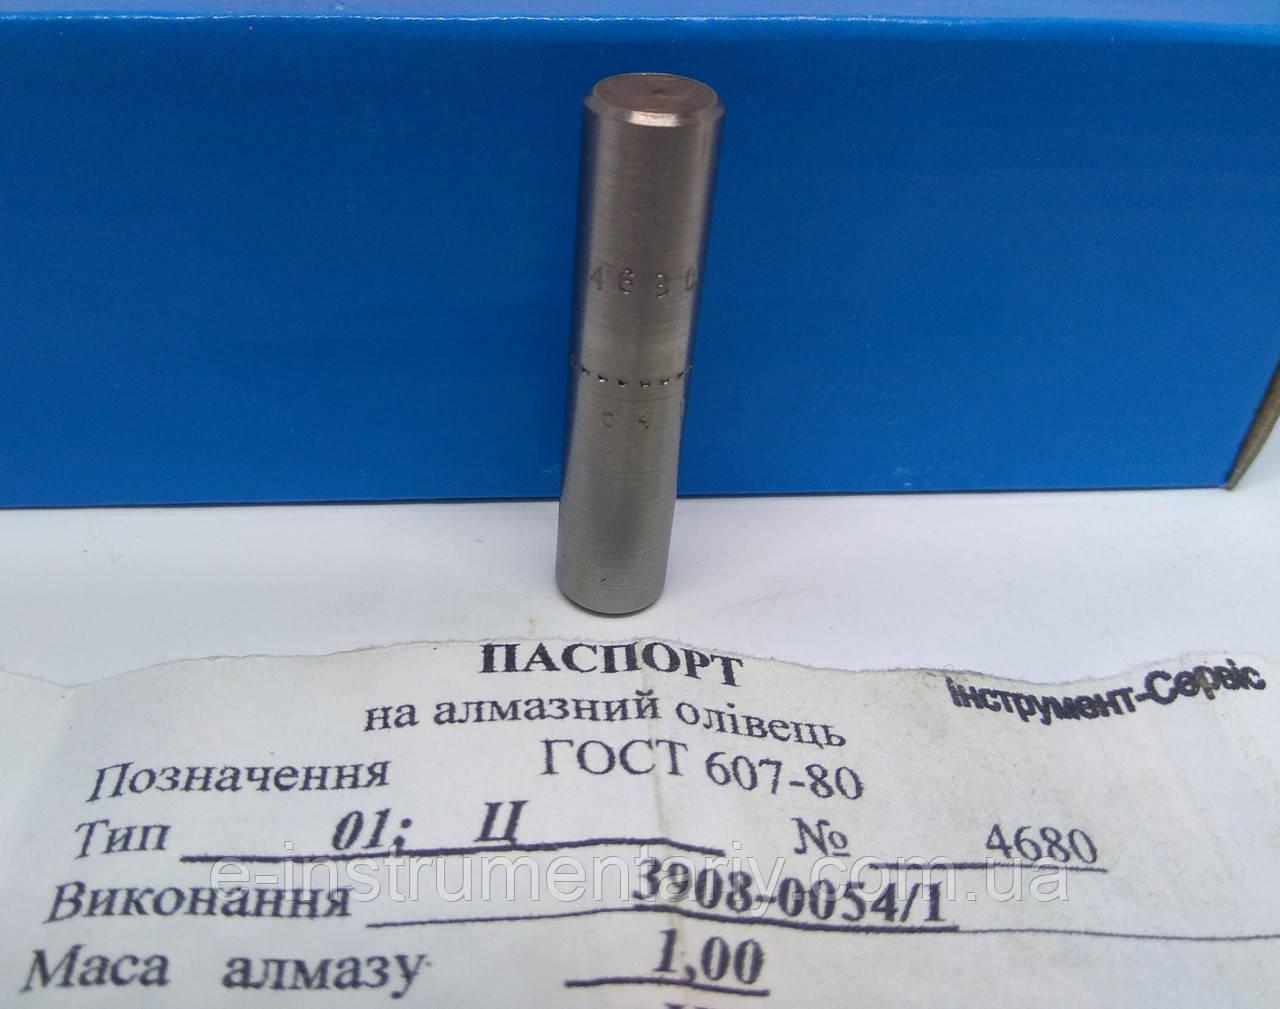 Карандаш алмазный 3908-0054/1 тип 01 исп.А 1,0 карат. качество- 1